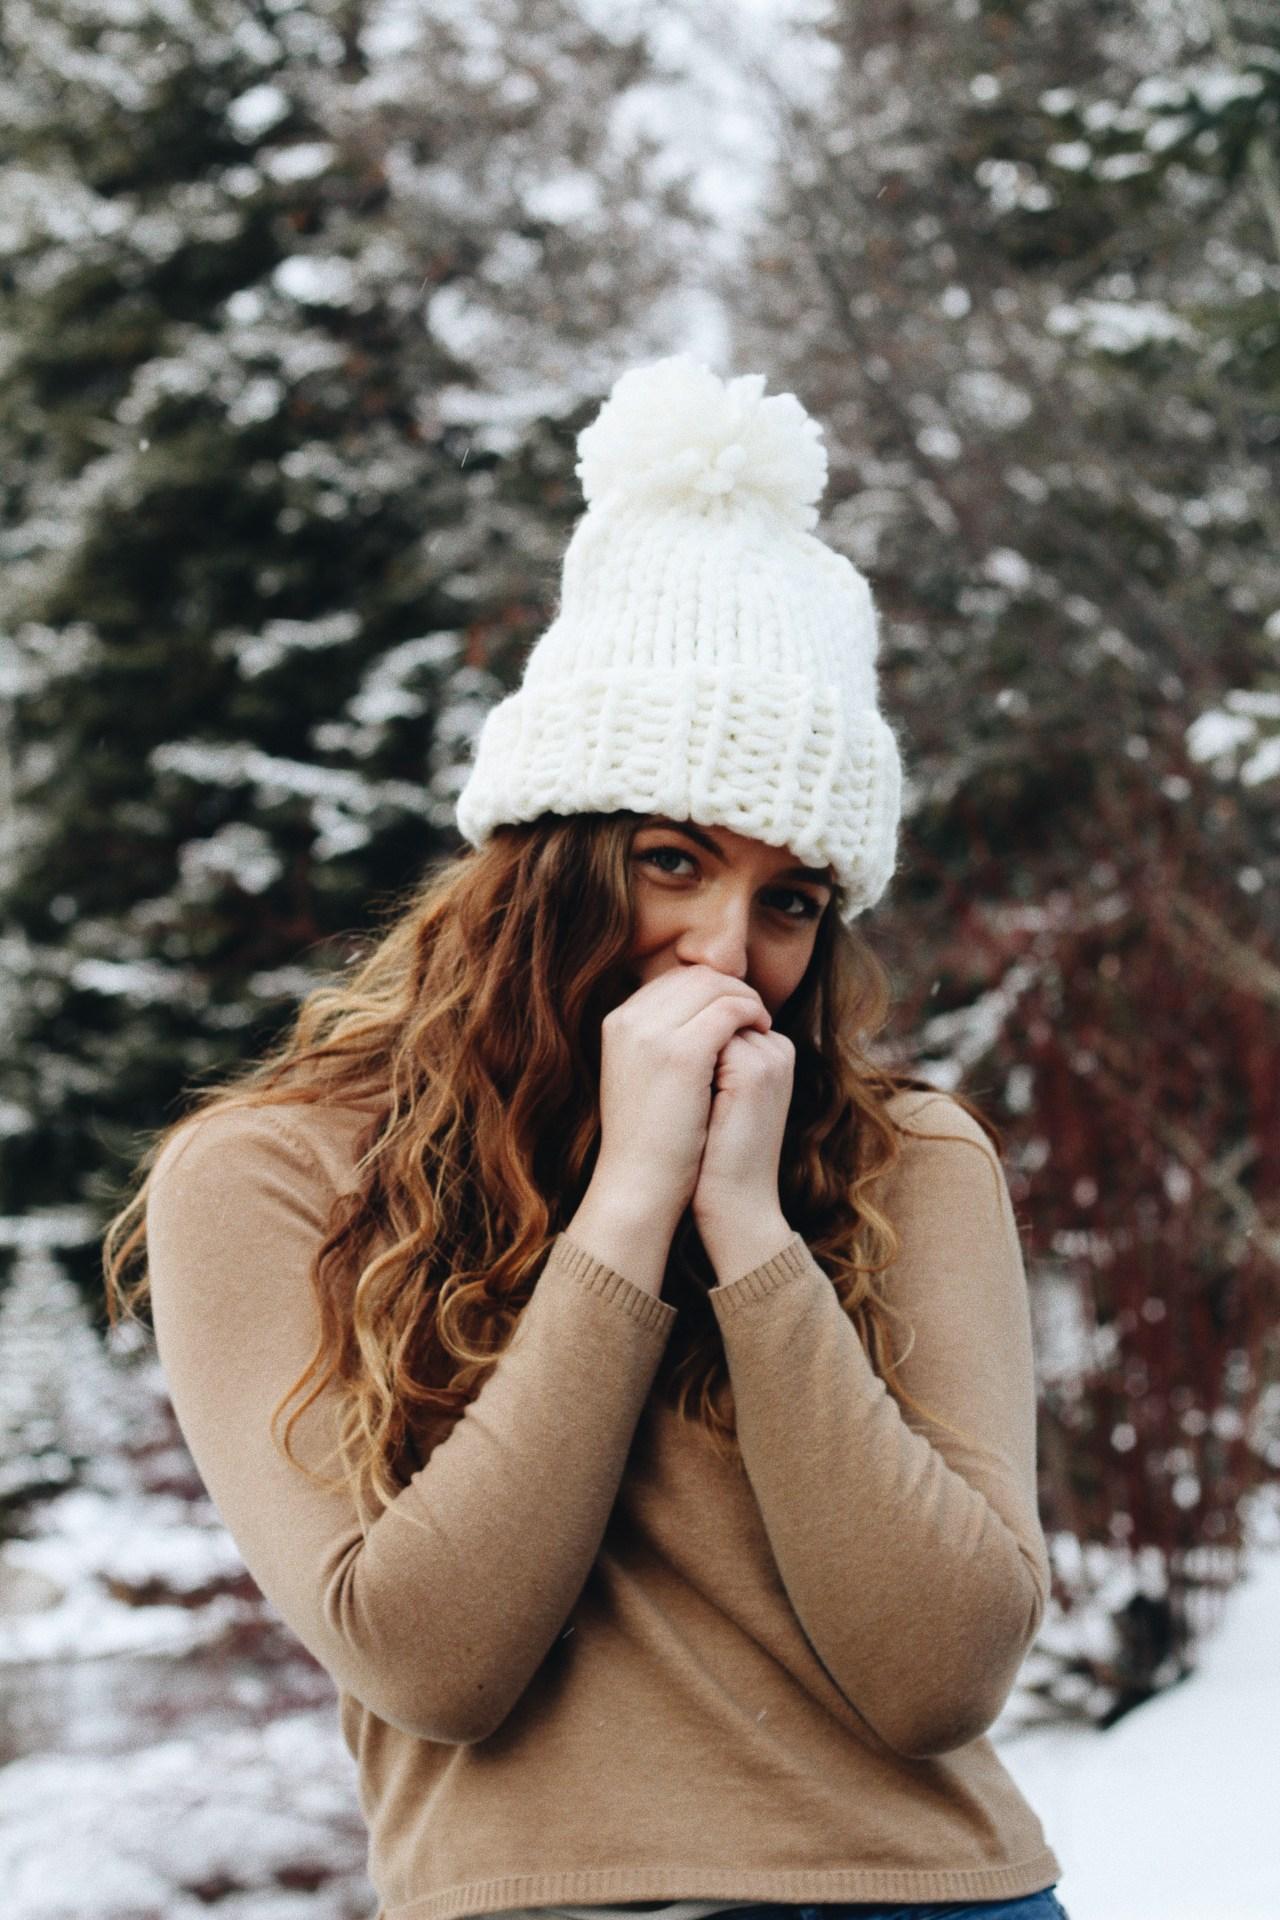 overcome social anxiety cold sundance utah portrait beanie